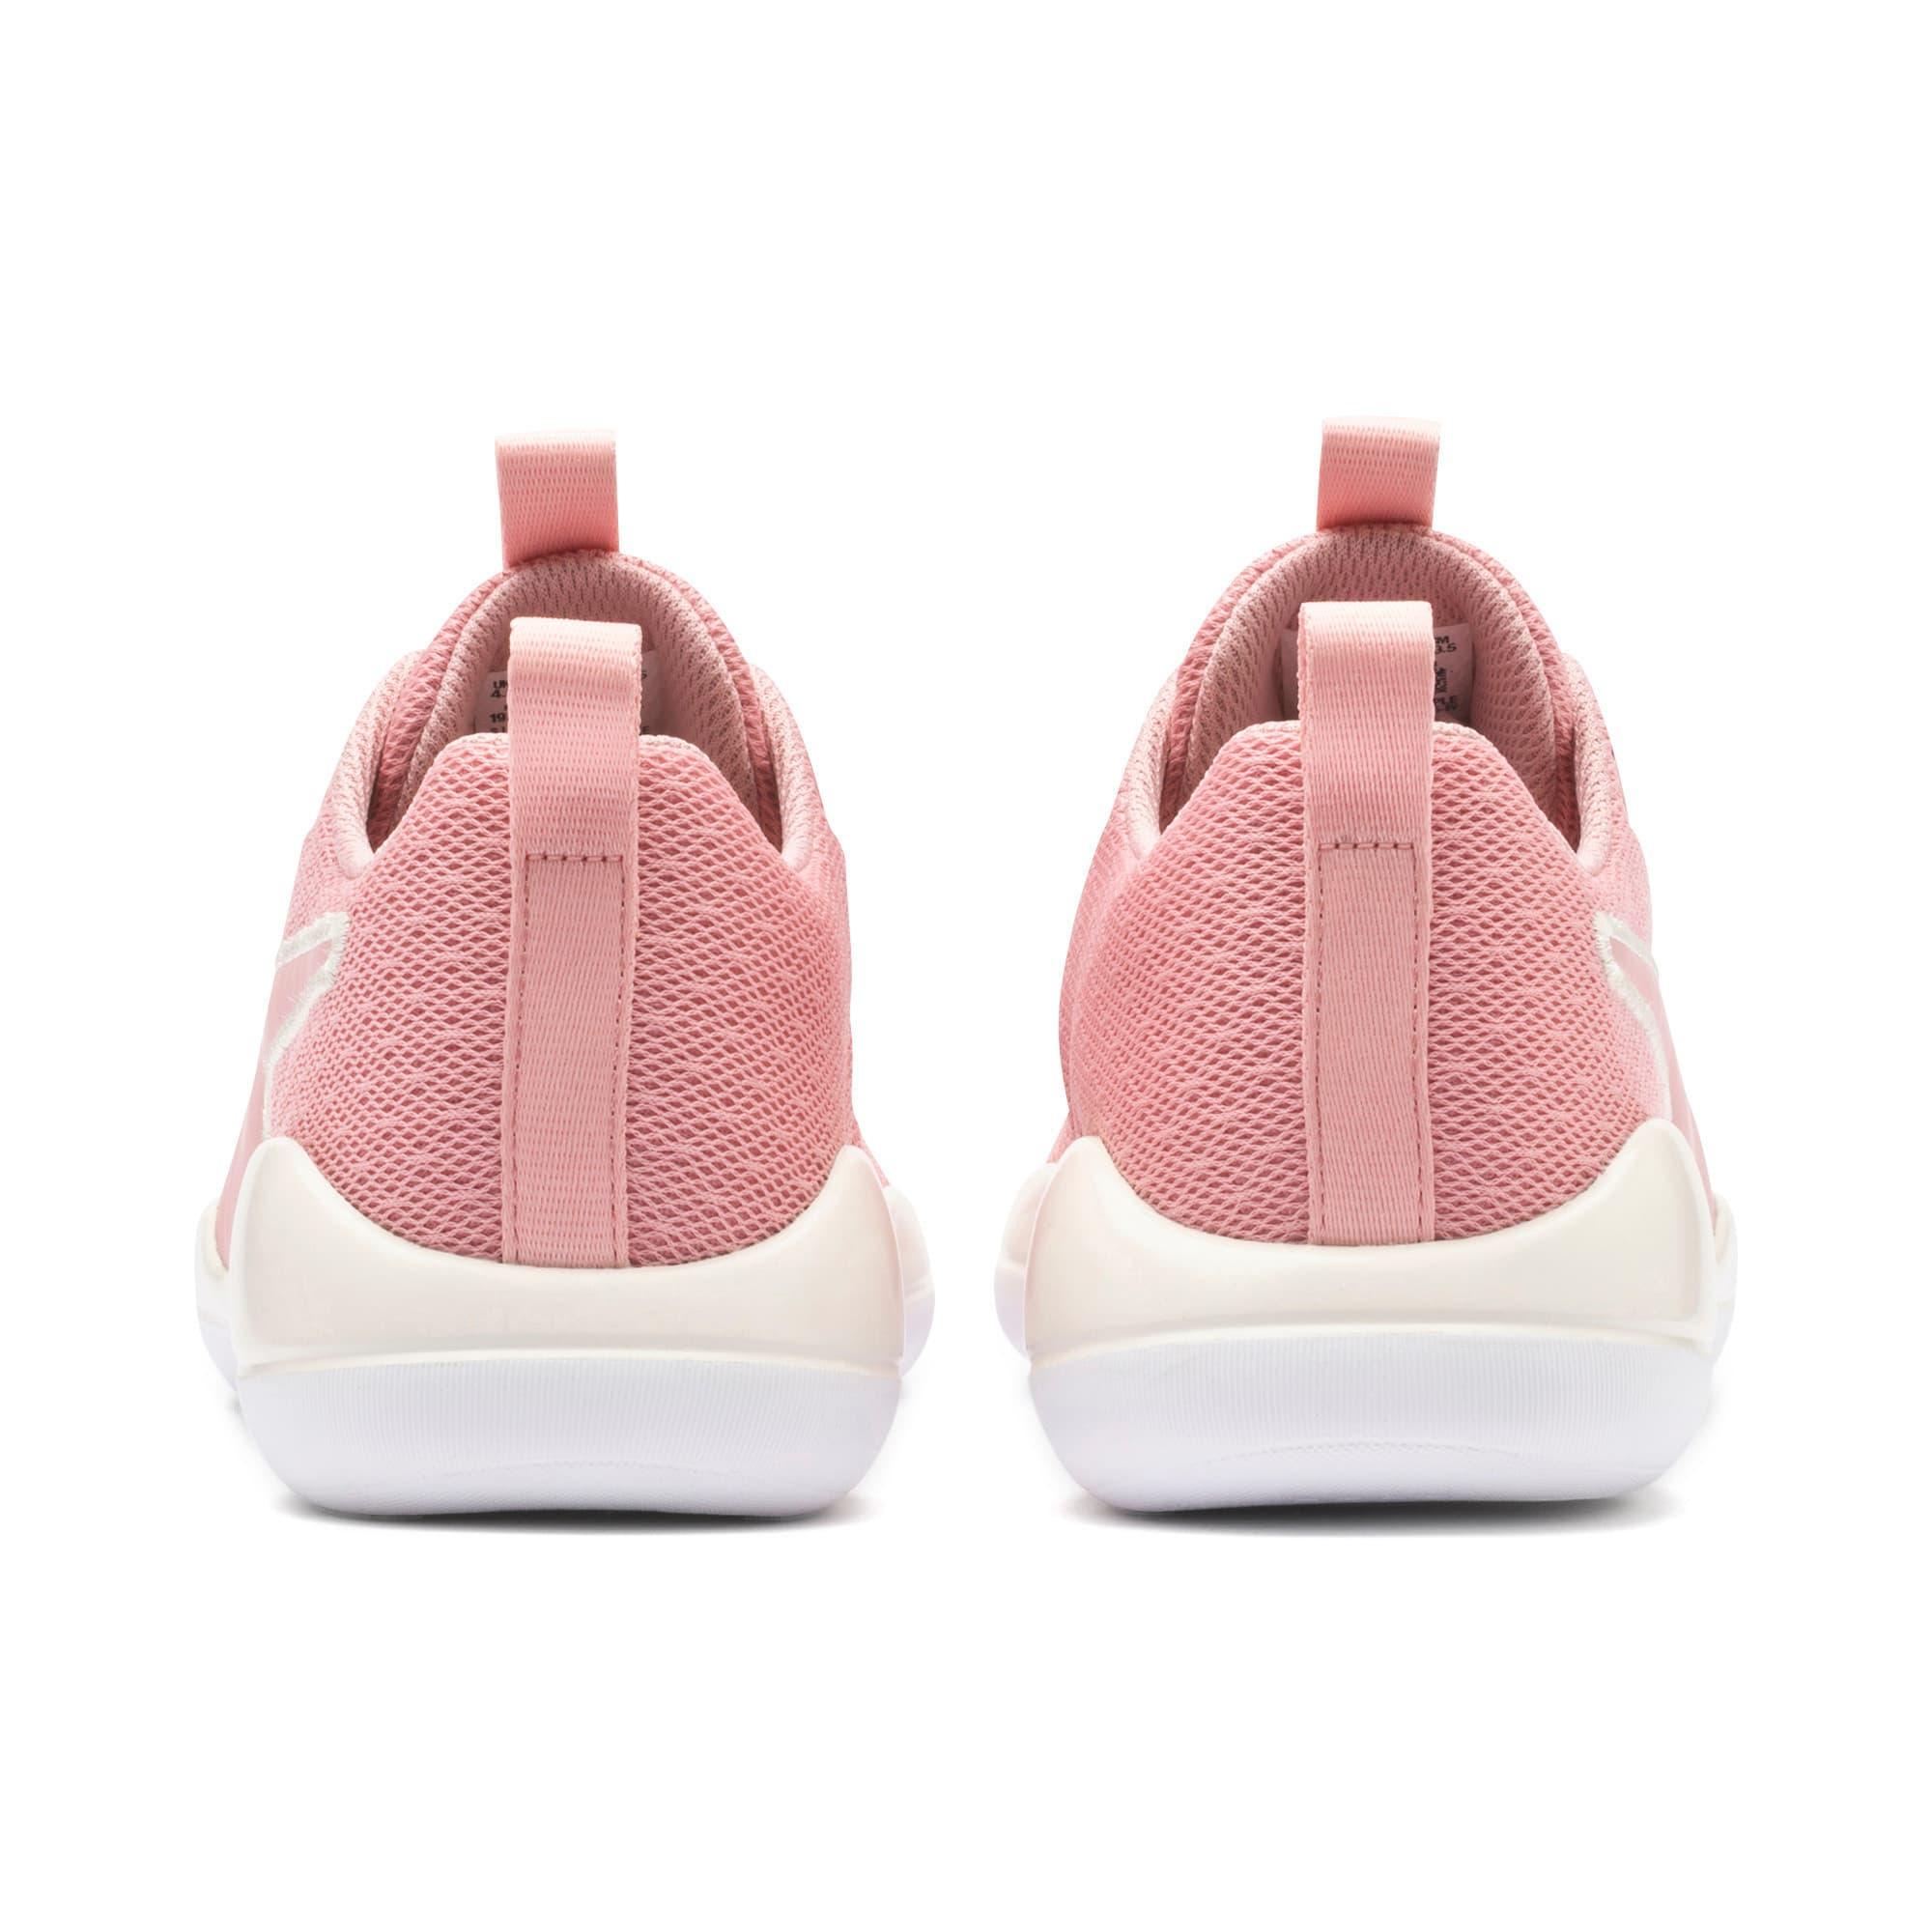 Thumbnail 6 of Flourish FS Women's Running Shoes, Bridal Rose-Puma White, medium-IND